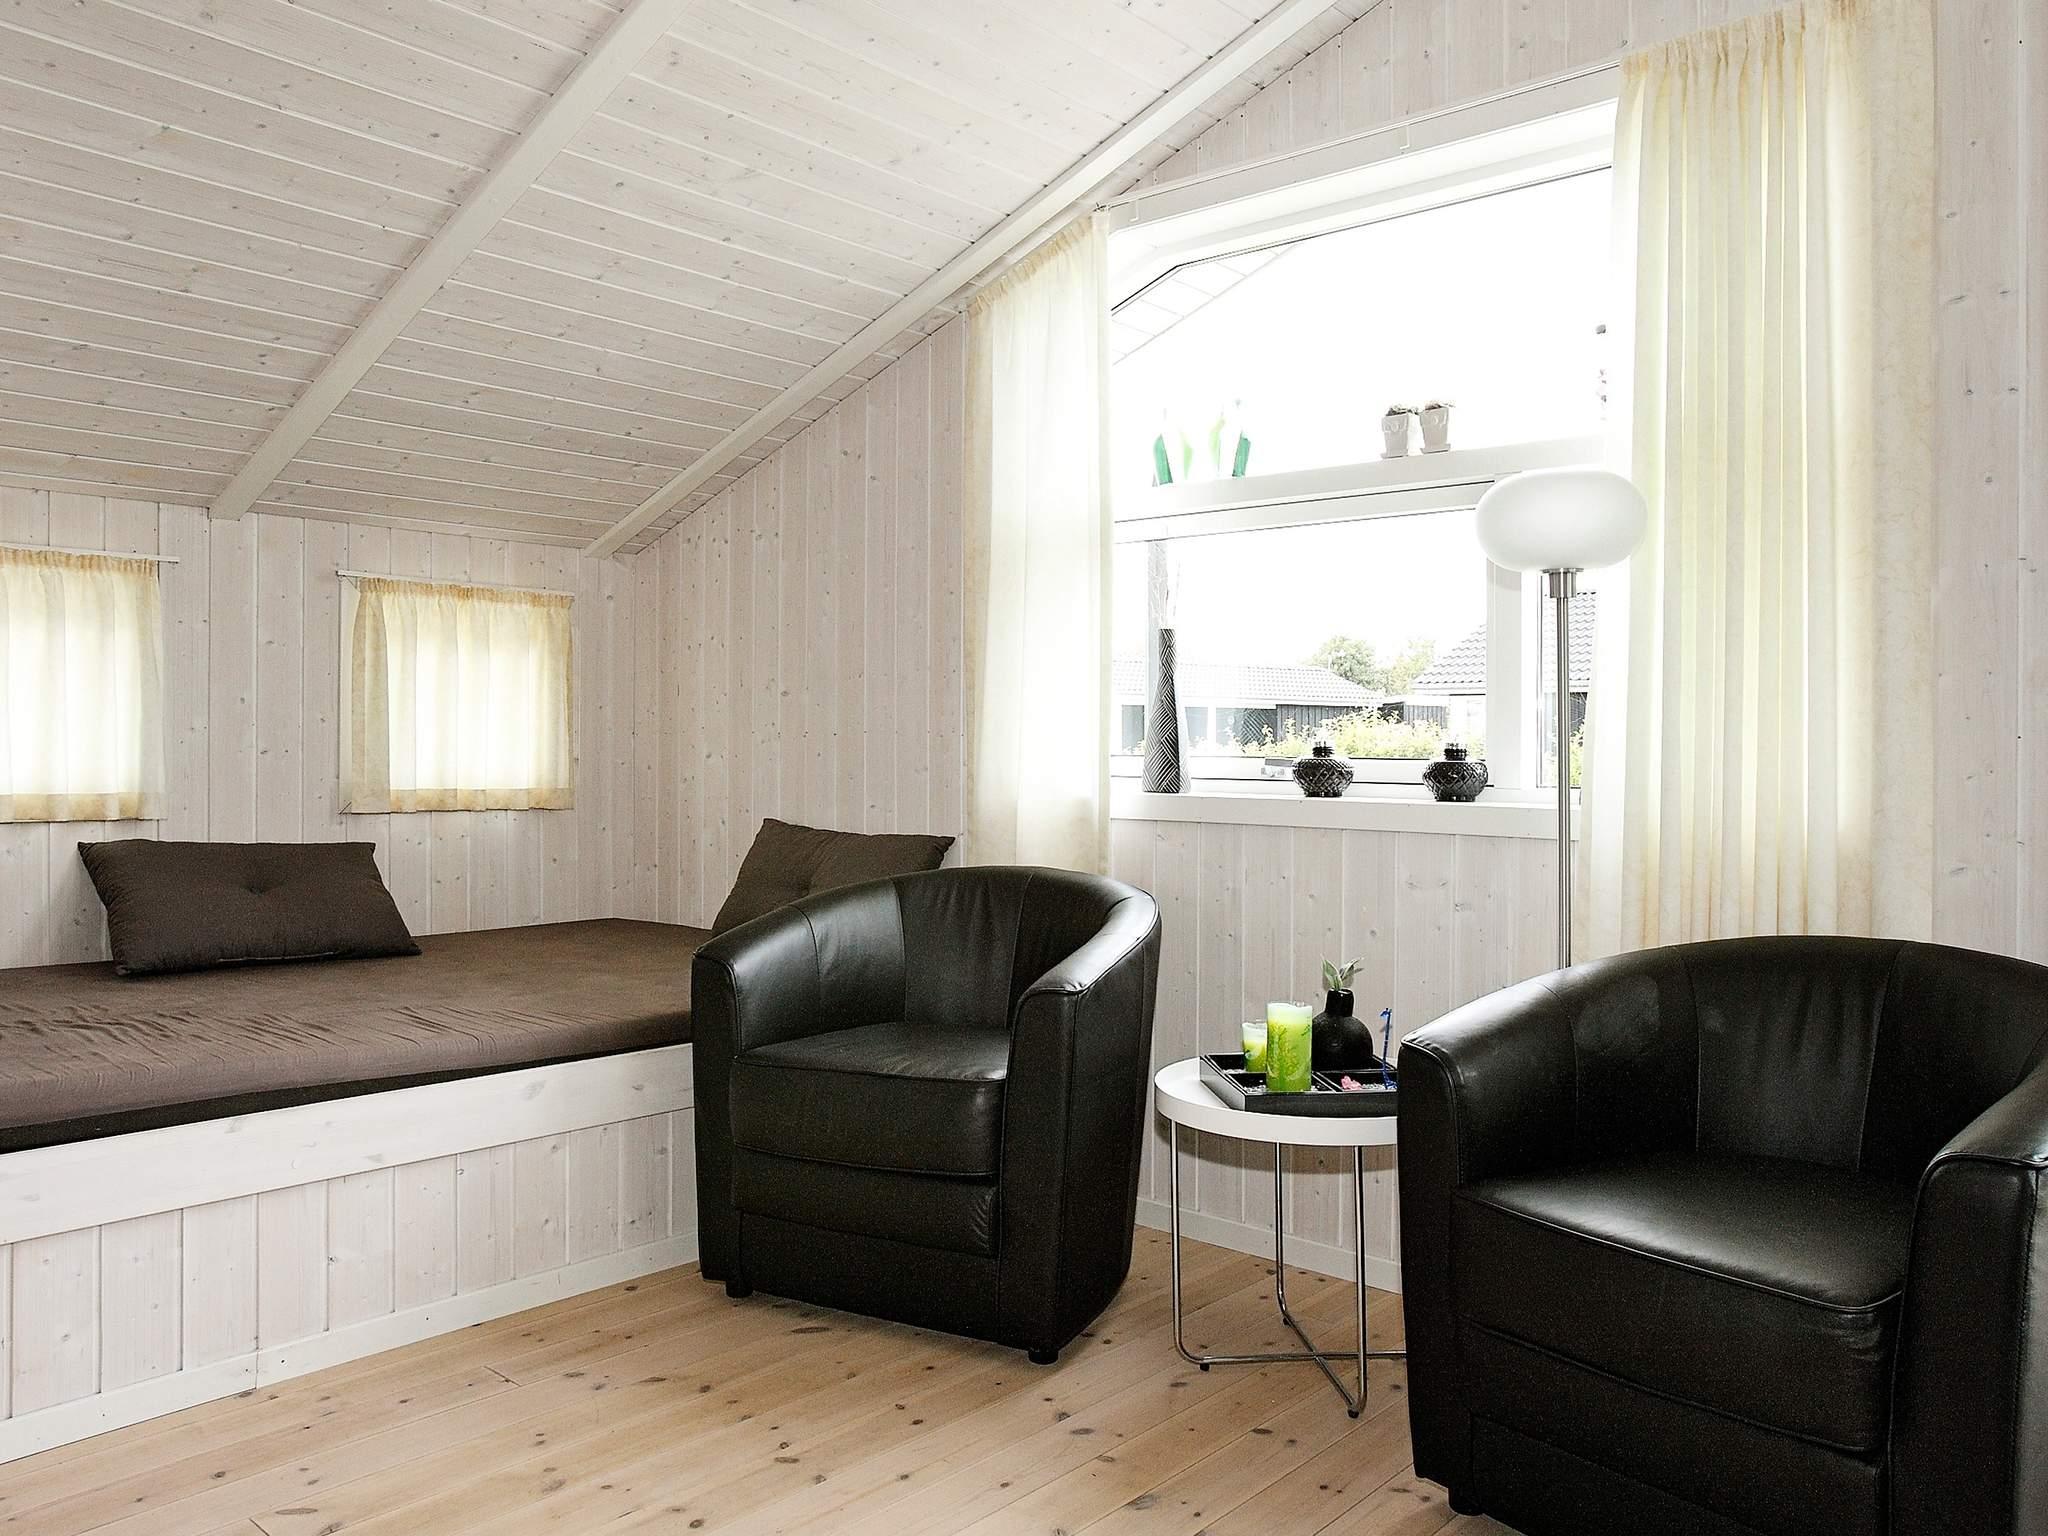 Ferienhaus Øster Hurup (1079907), Øster Hurup, , Ostjütland, Dänemark, Bild 2